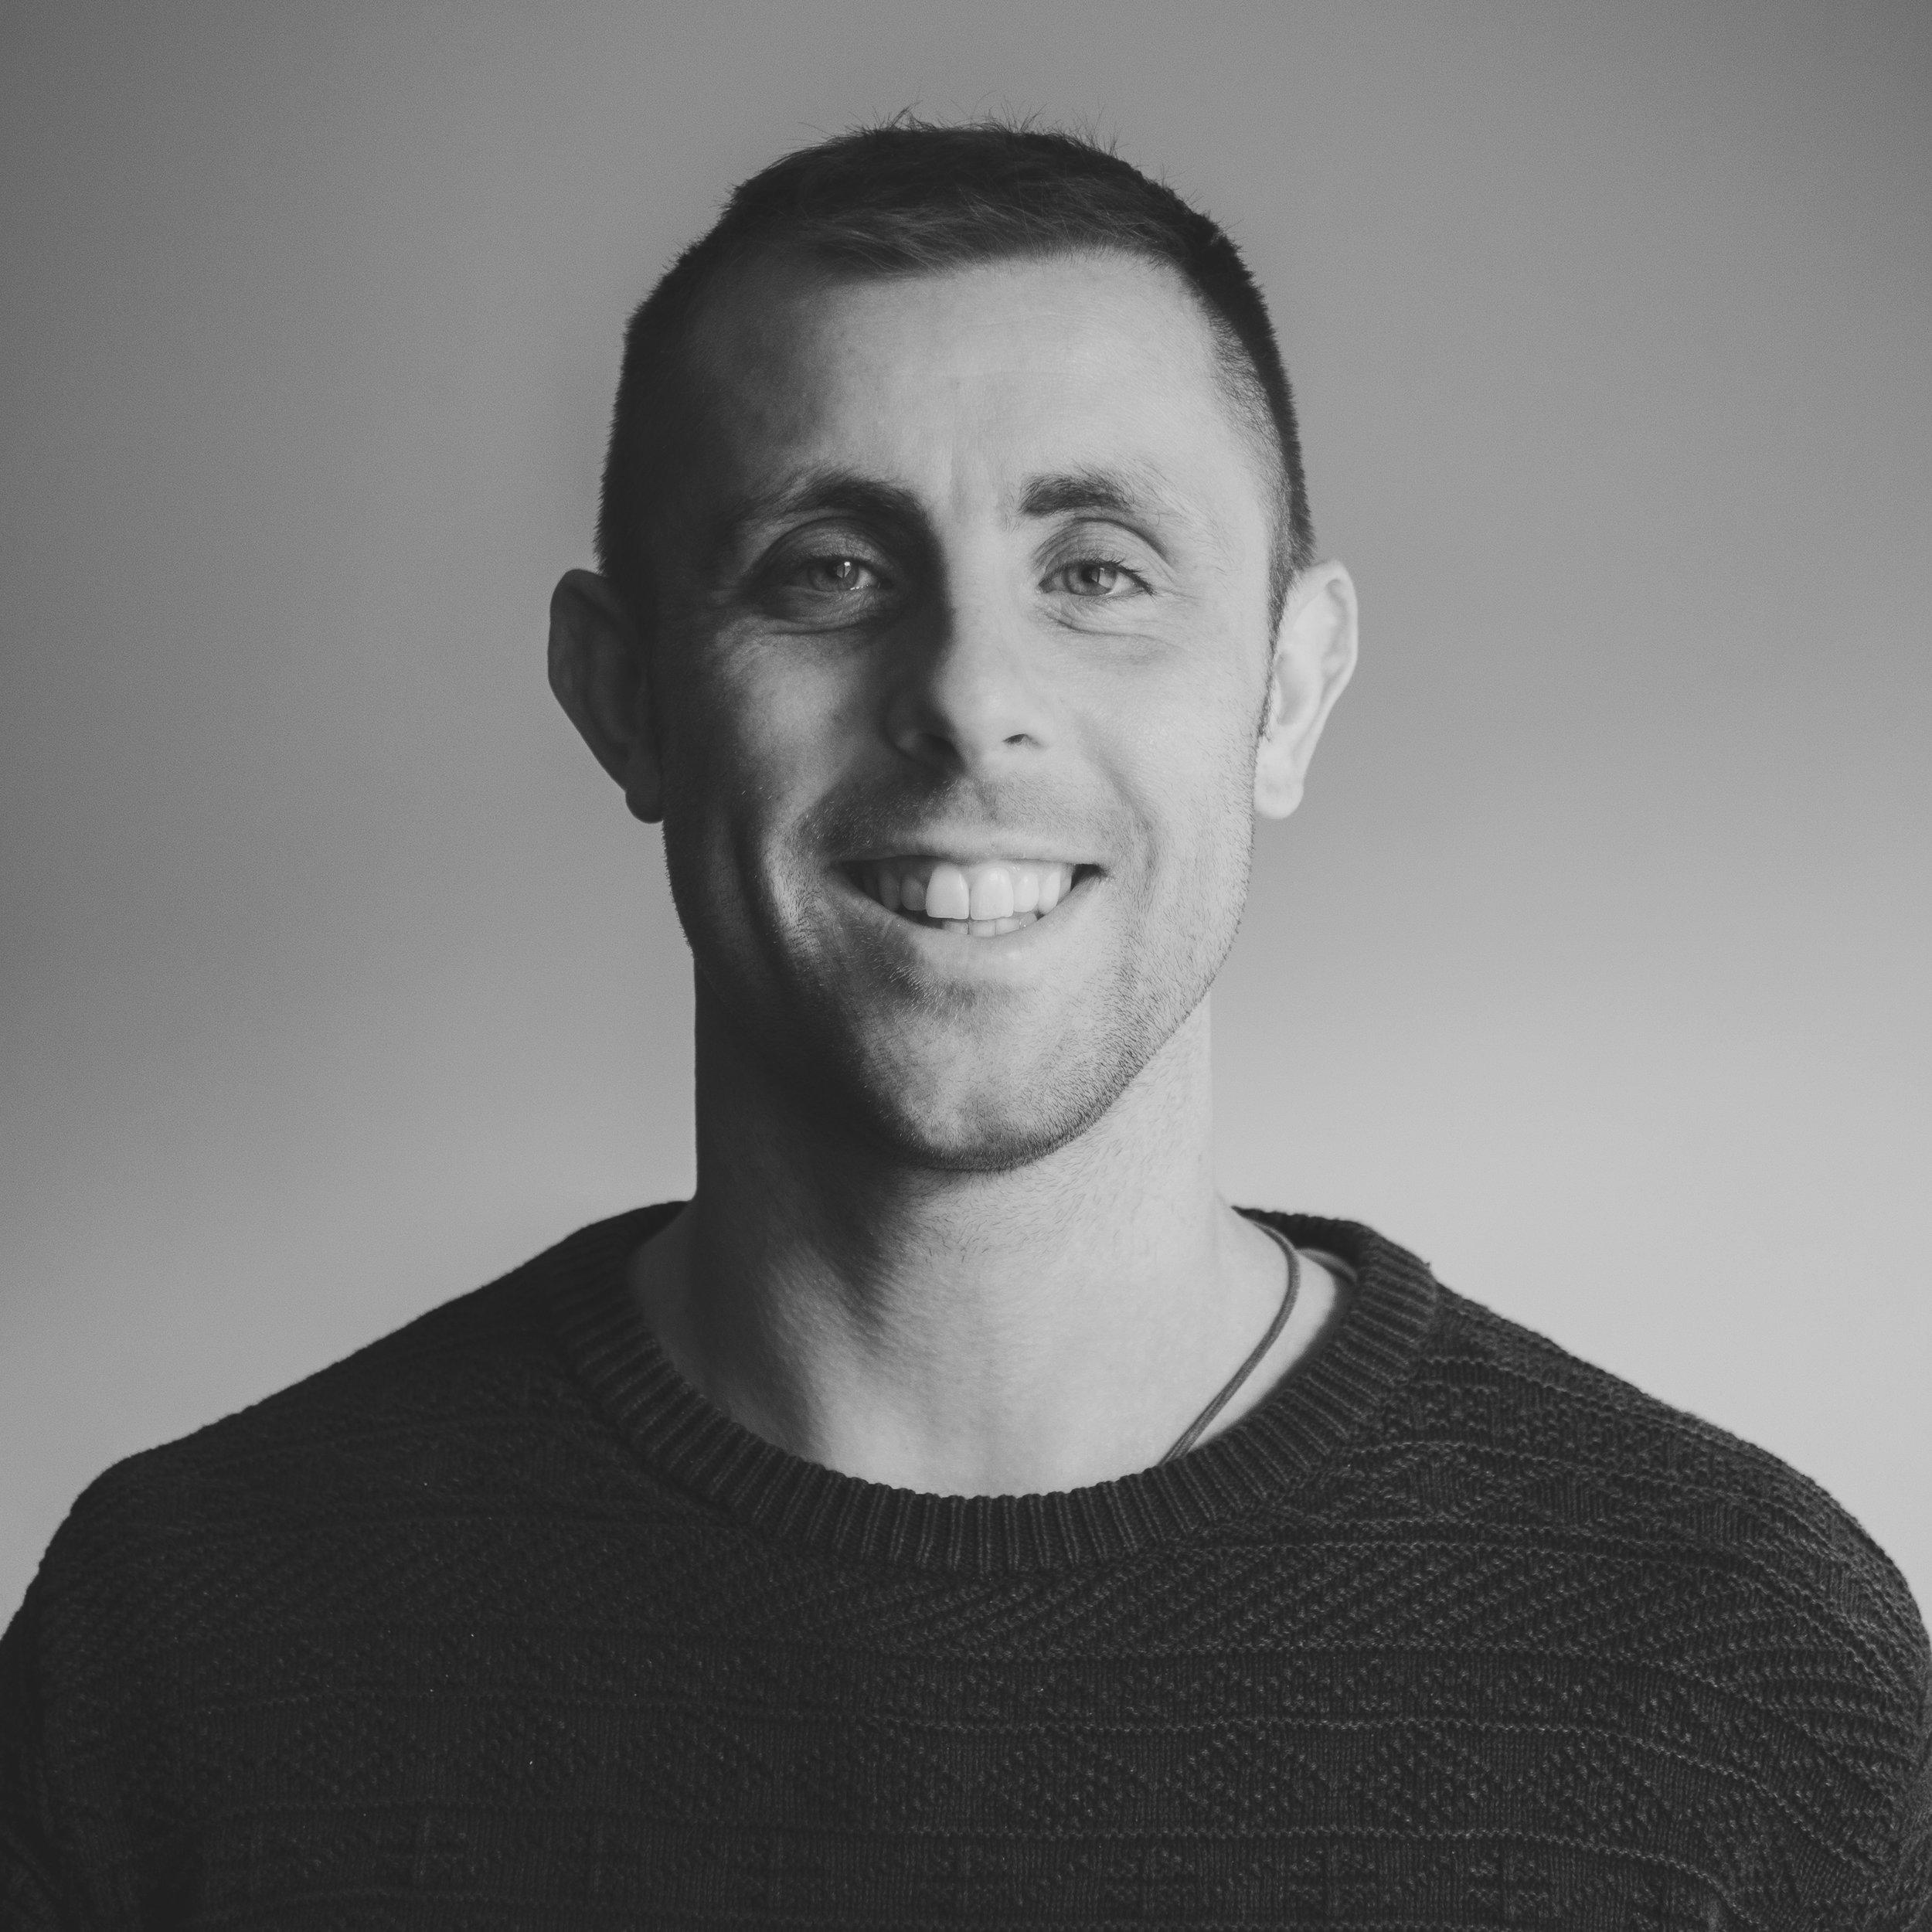 BEN ASHMOLE - CO-FOUNDER & CREATIVE DIRECTOR-Story TellerVideo ProducerContent Creator-ben@connectcreative.co